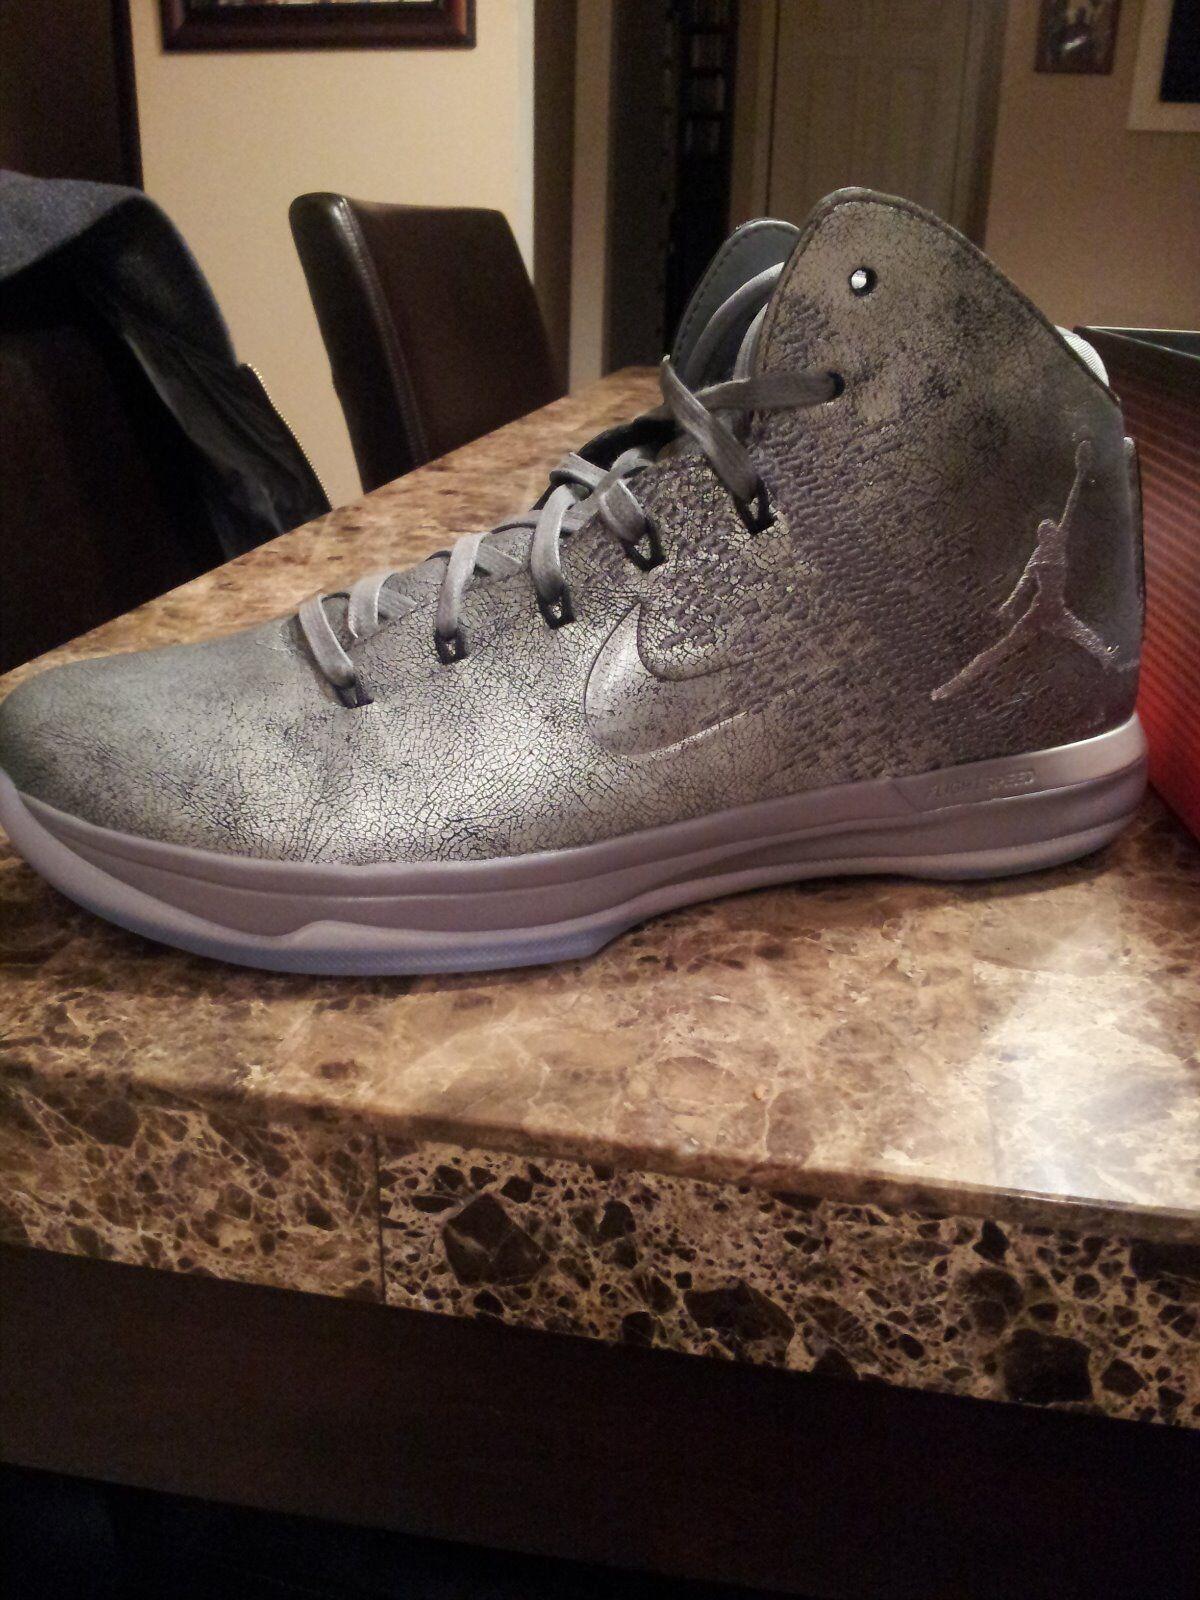 Nike Air Jordan 31 XXX1 'Premium' Trophy Room Comfortable Wild casual shoes